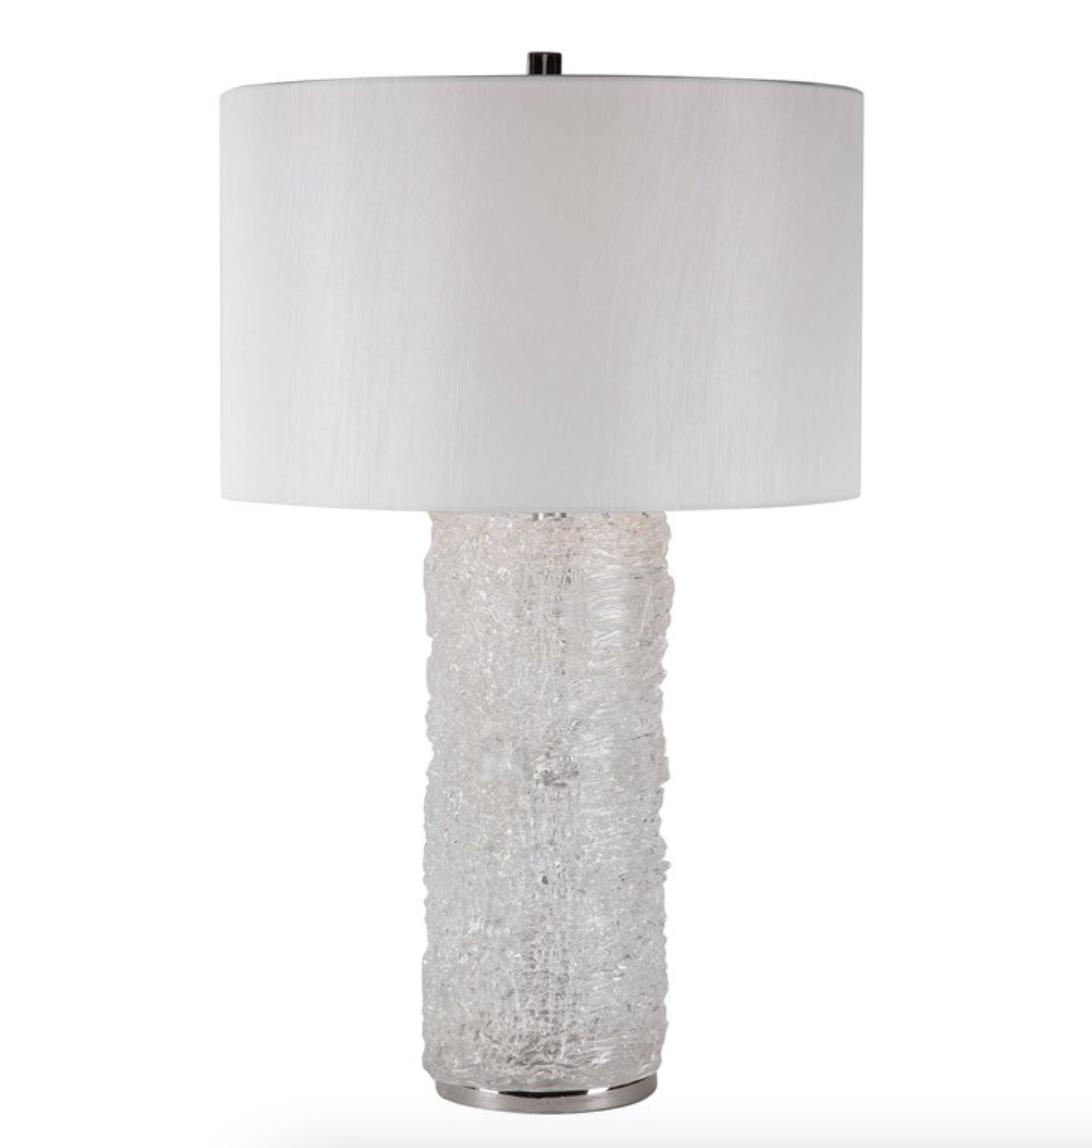 Sleet Table Lamp